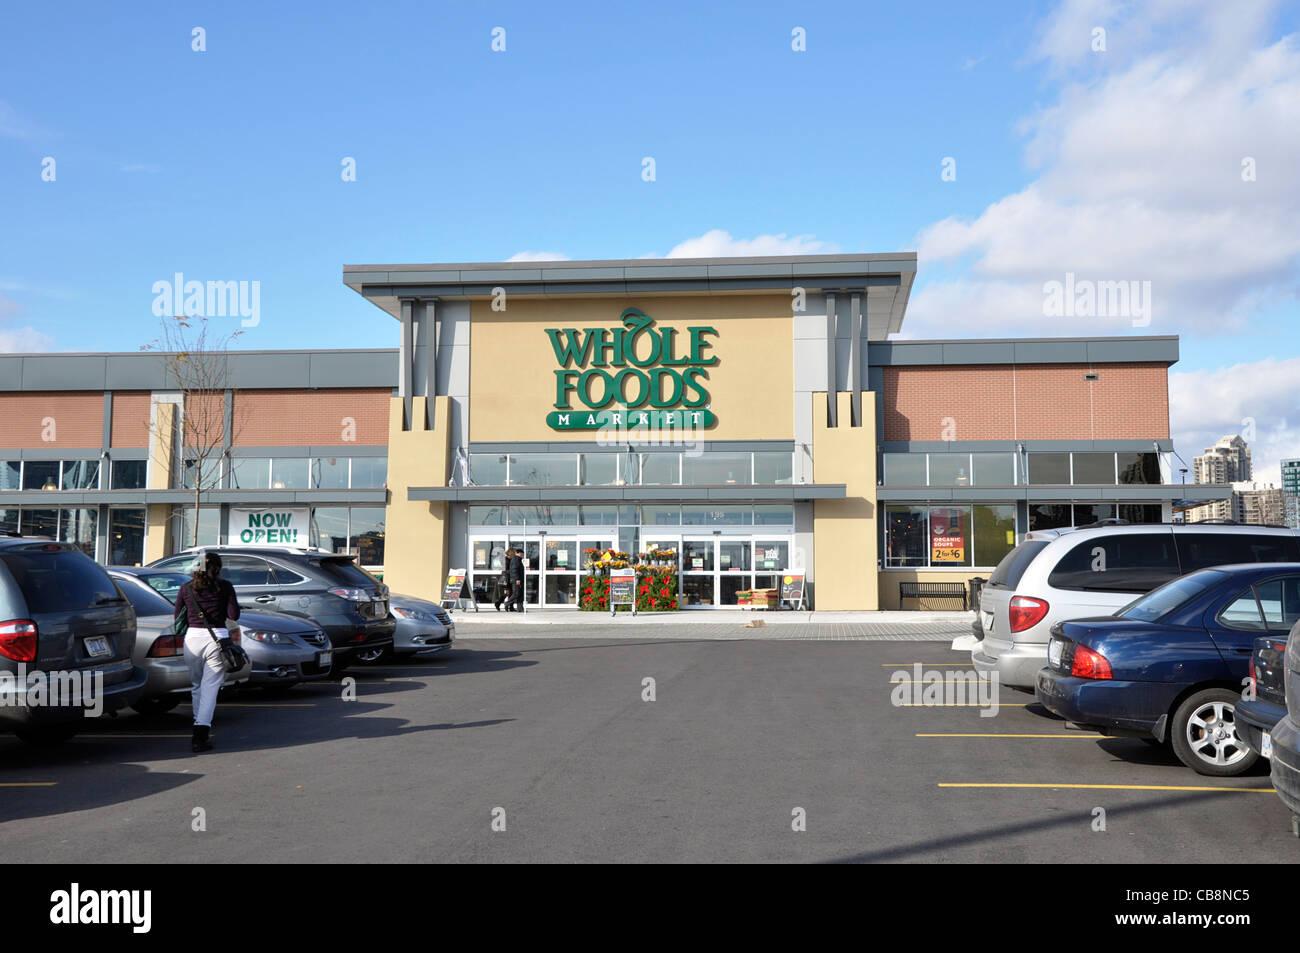 Whole Foods Dublin Turkey